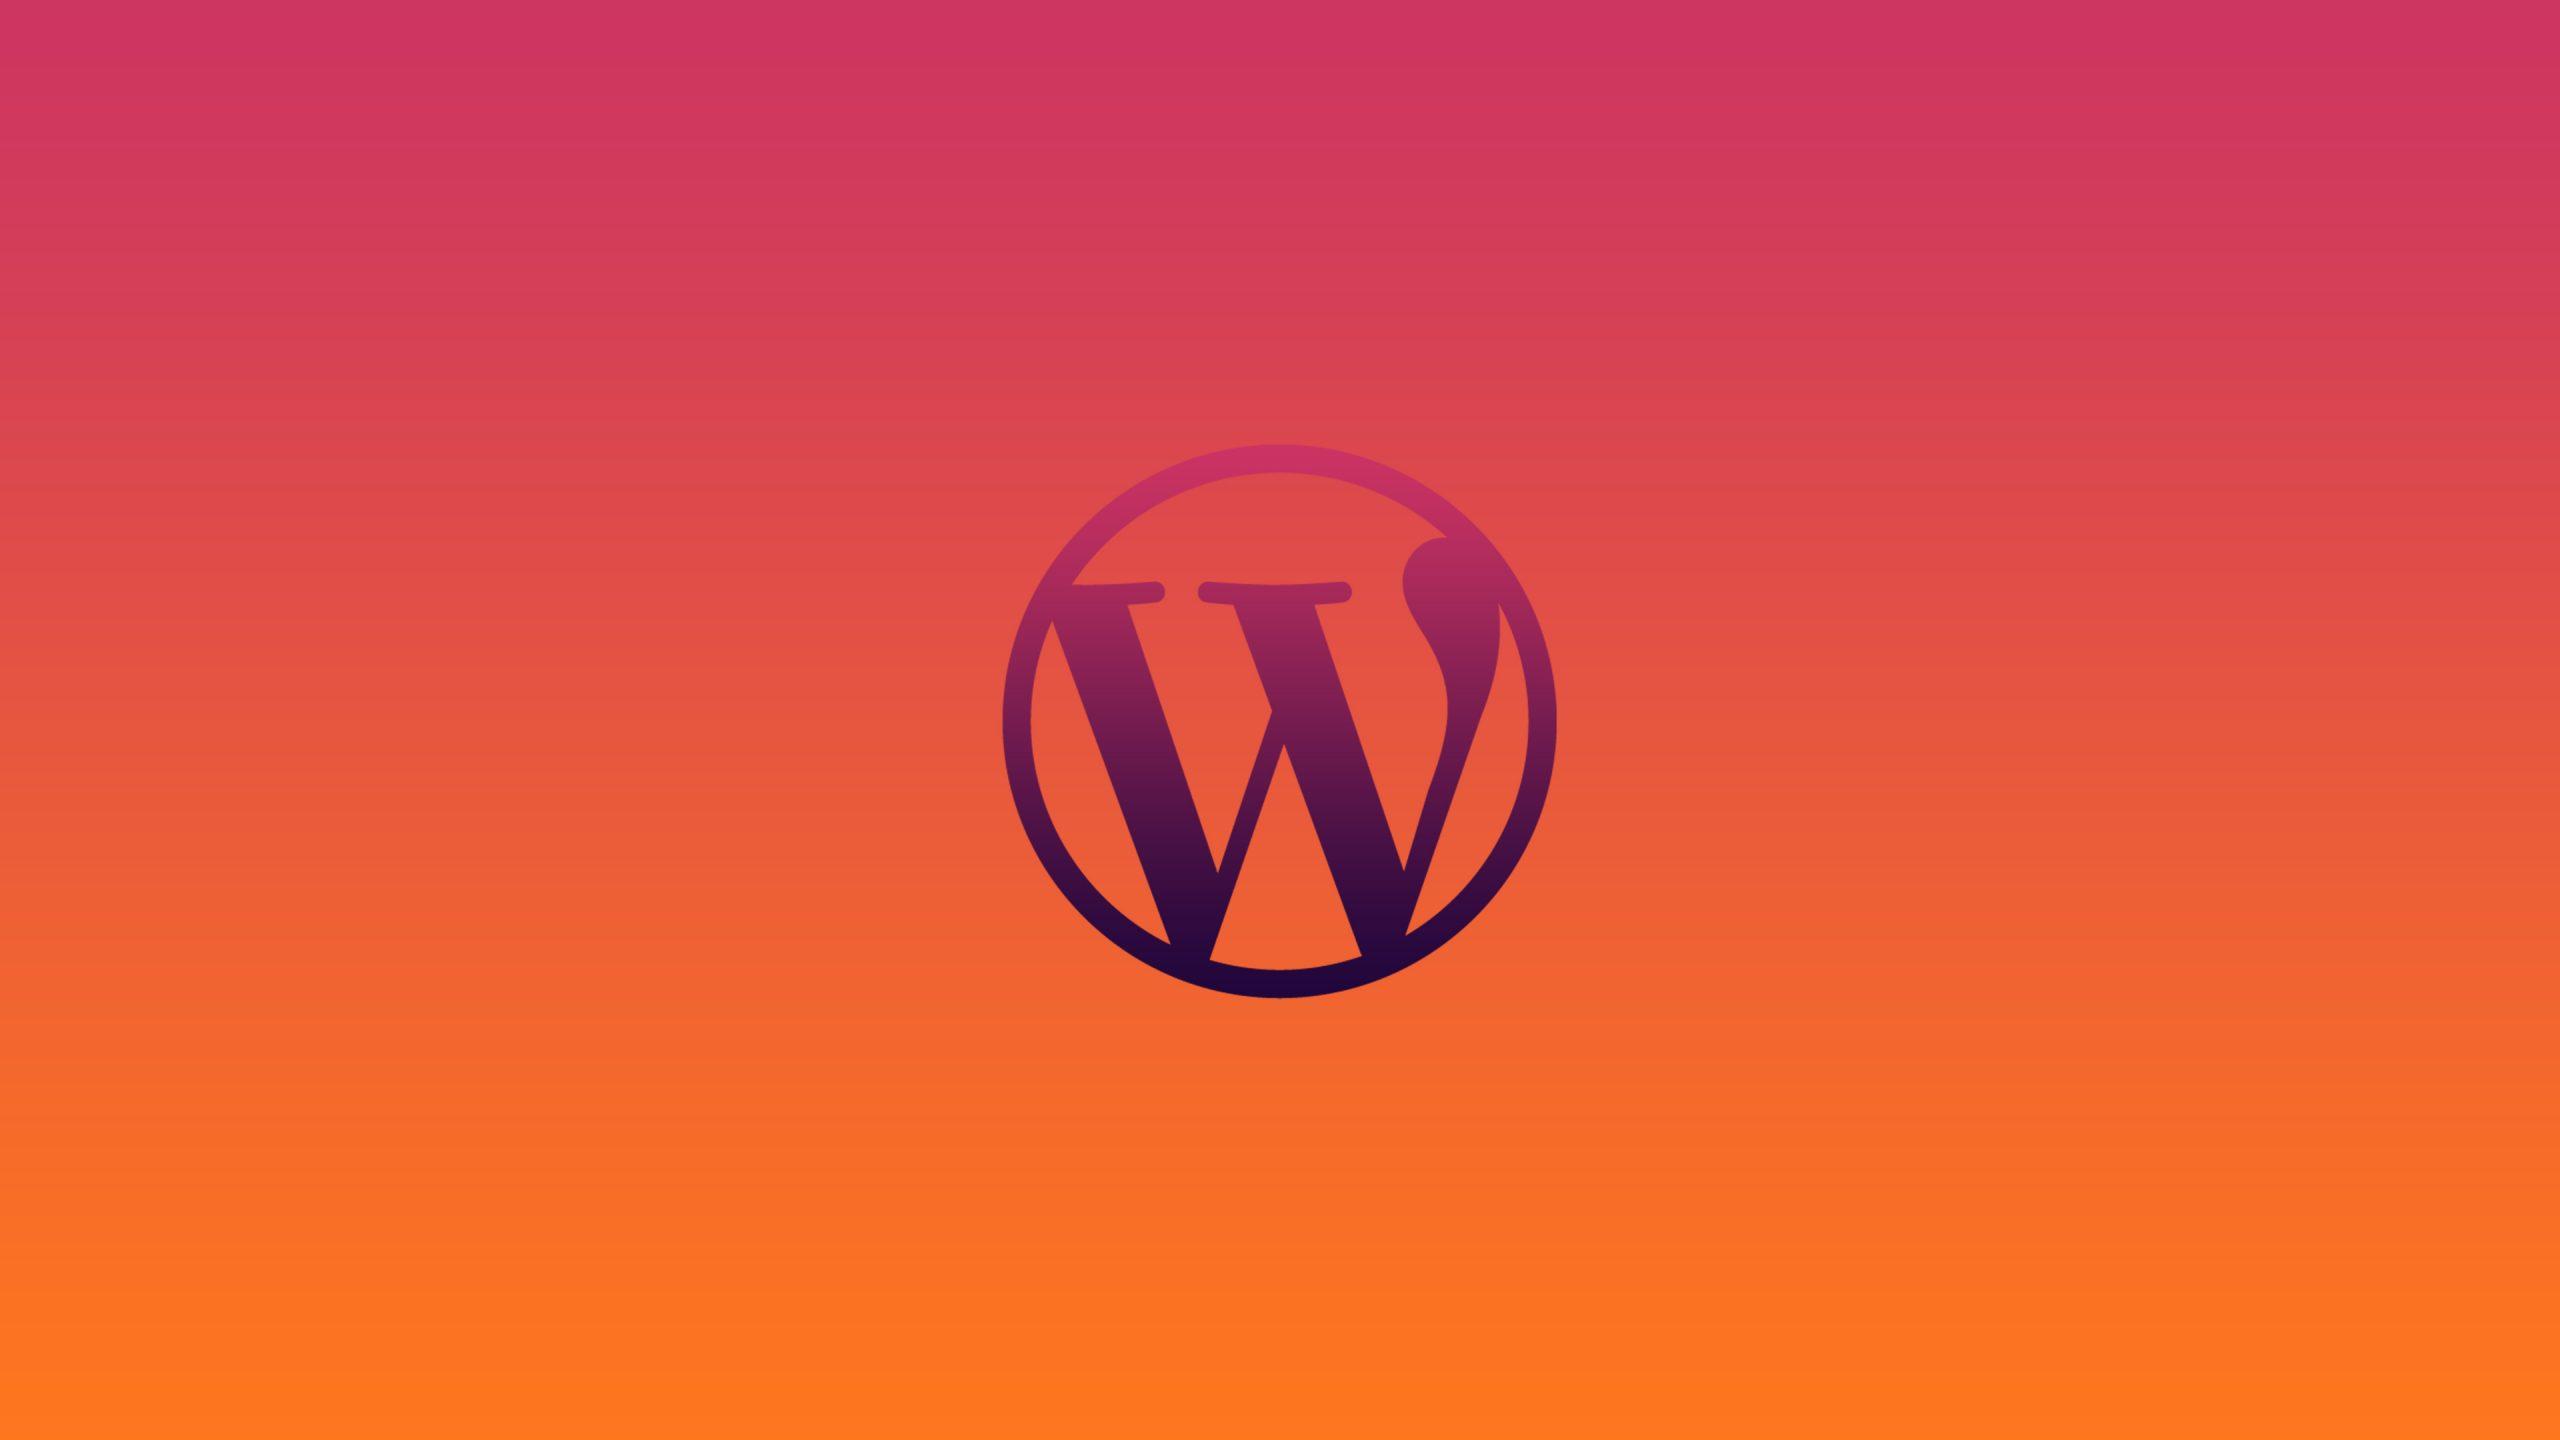 wordpress logo background wallpaper 74194